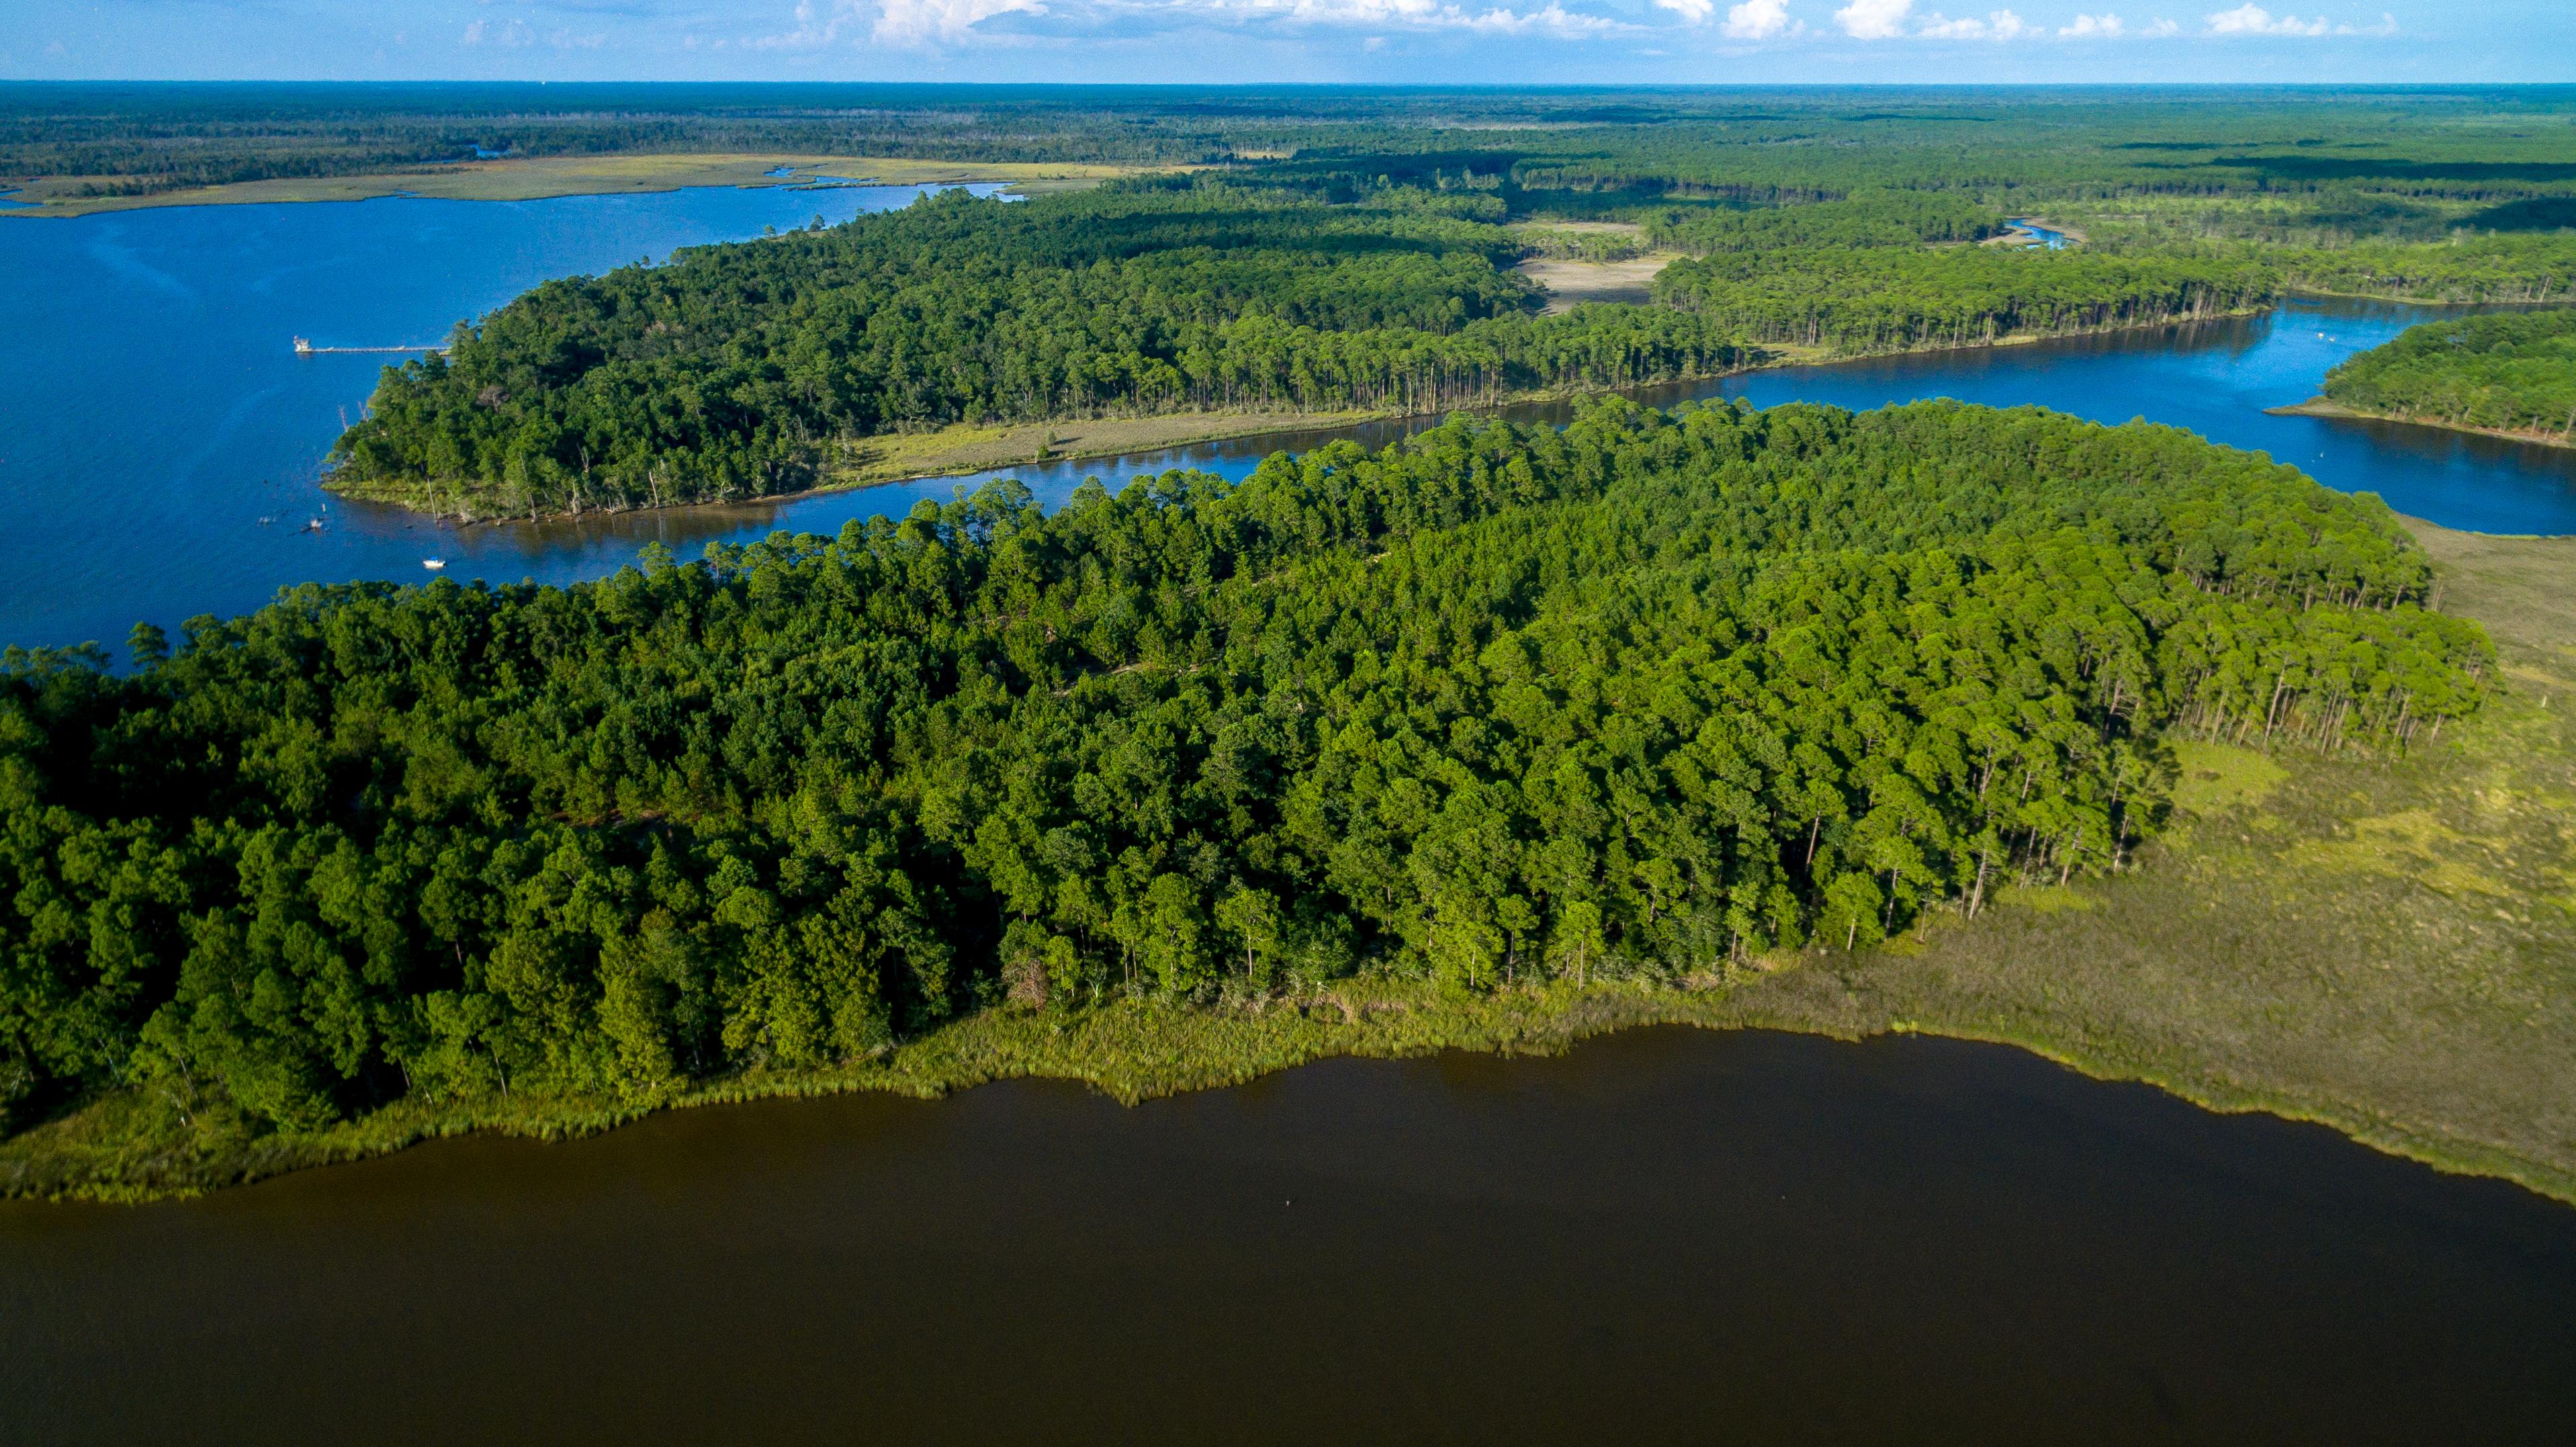 The Island of South Walton community image